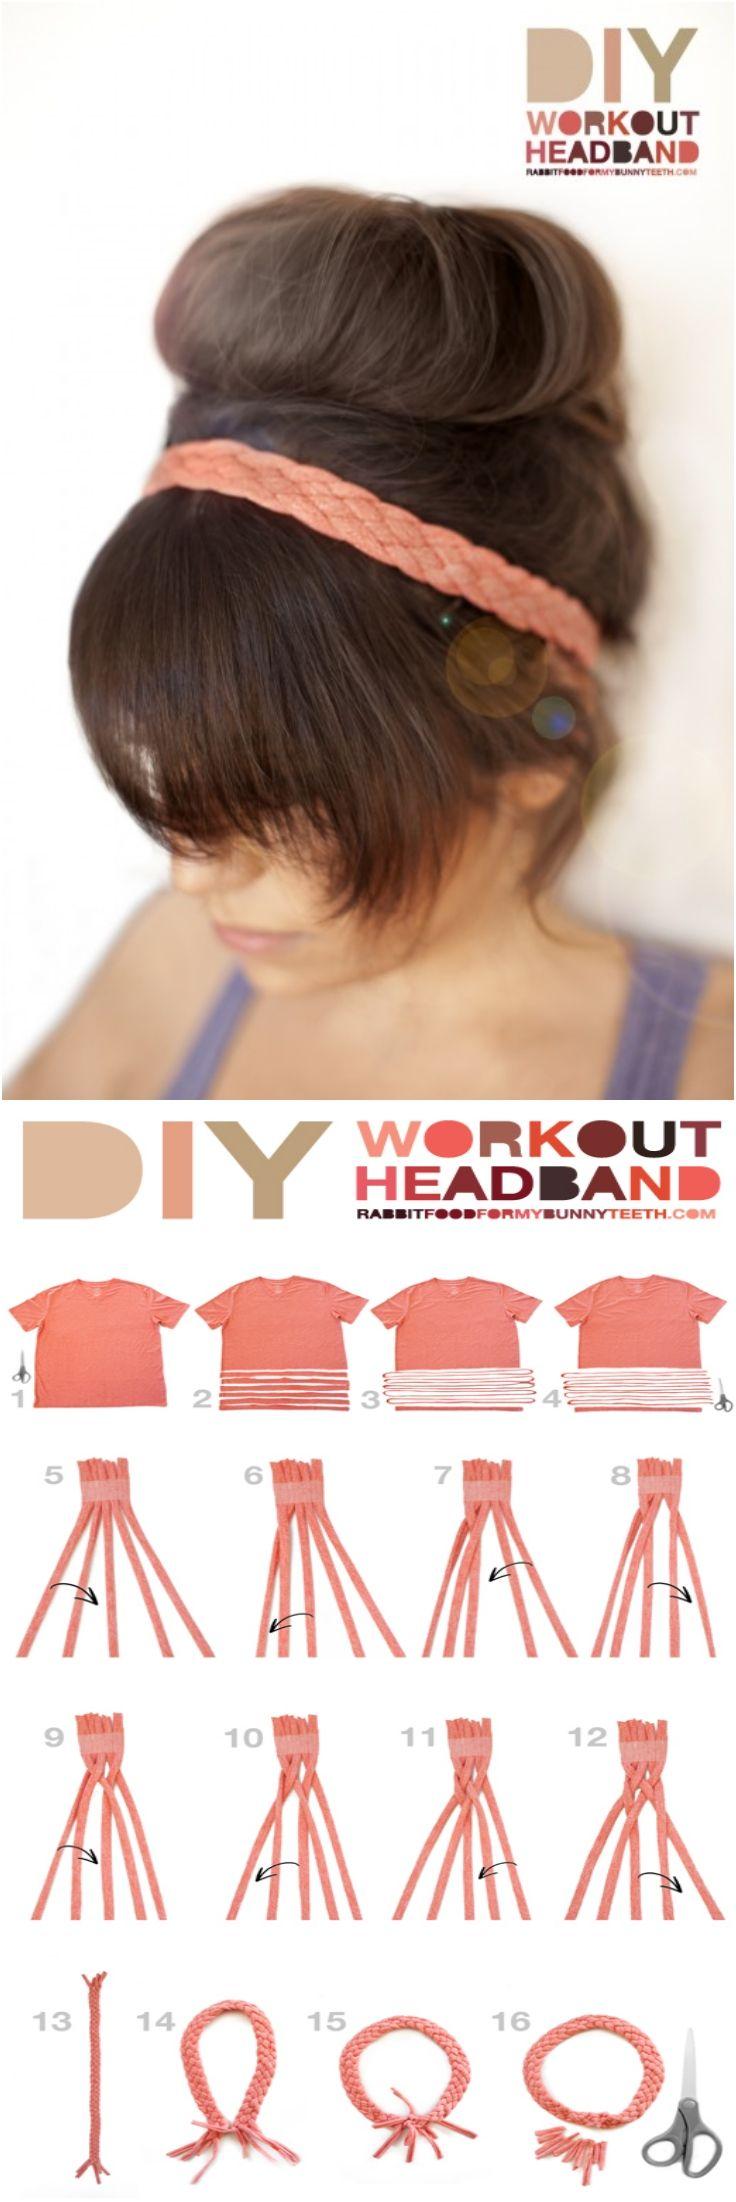 DIY Workout Headband